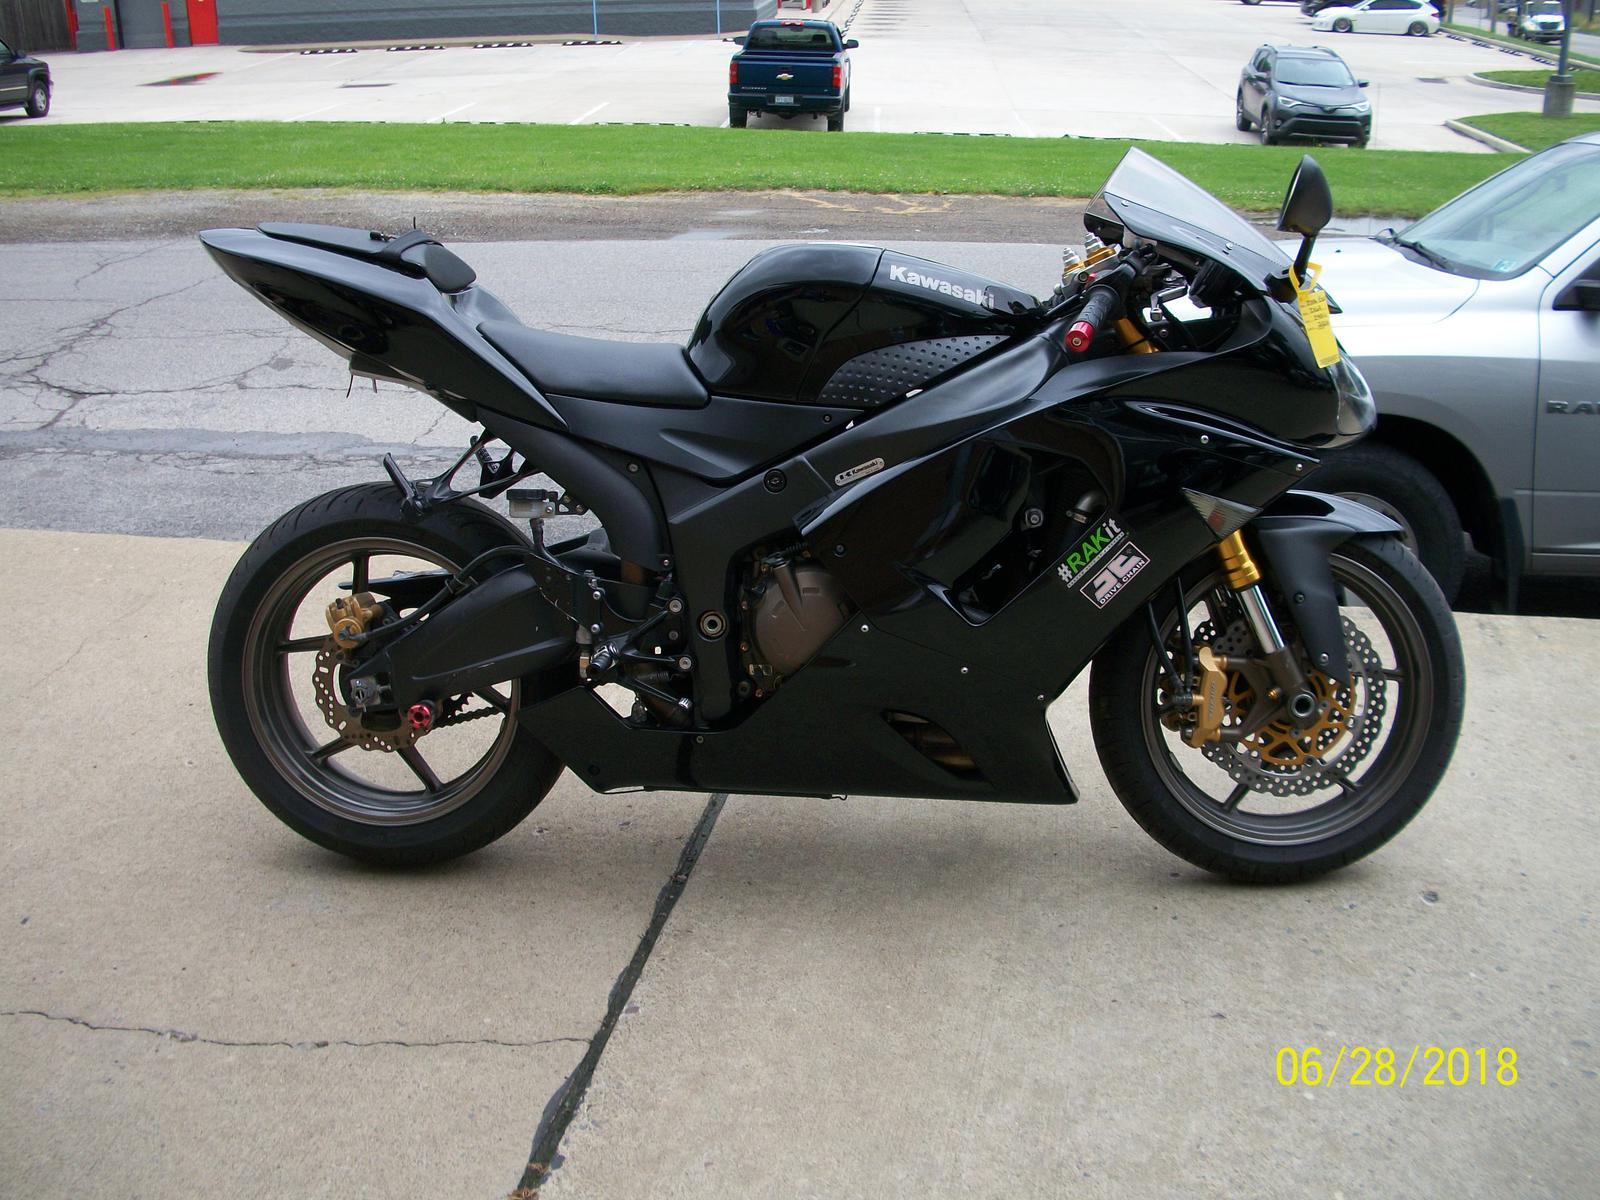 2006 Kawasaki ZX6R for sale in New Castle, PA. Sander's Yamaha ...